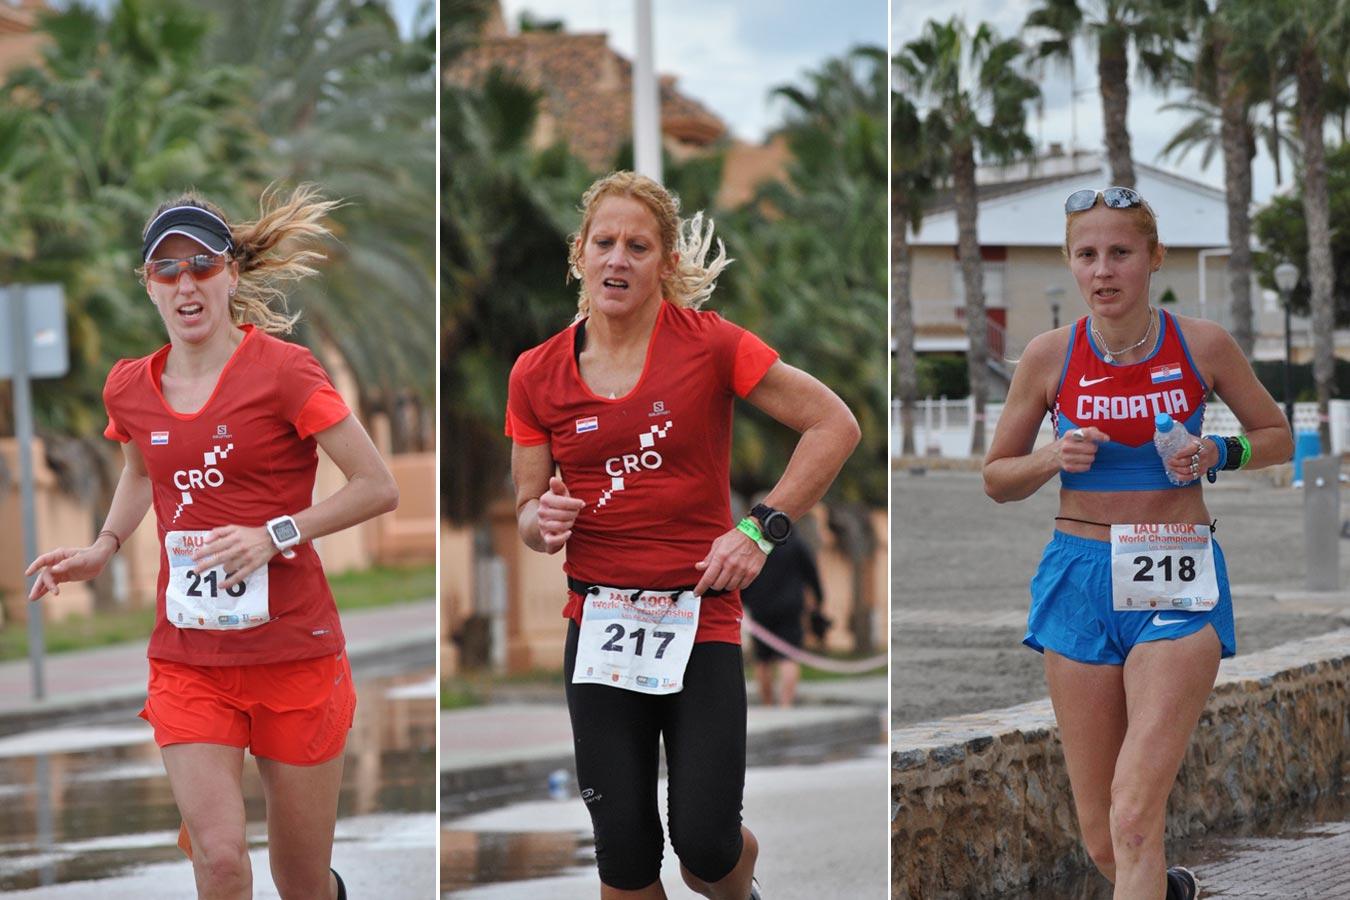 25. trening: Kad narastem trčat ću ultramaraton